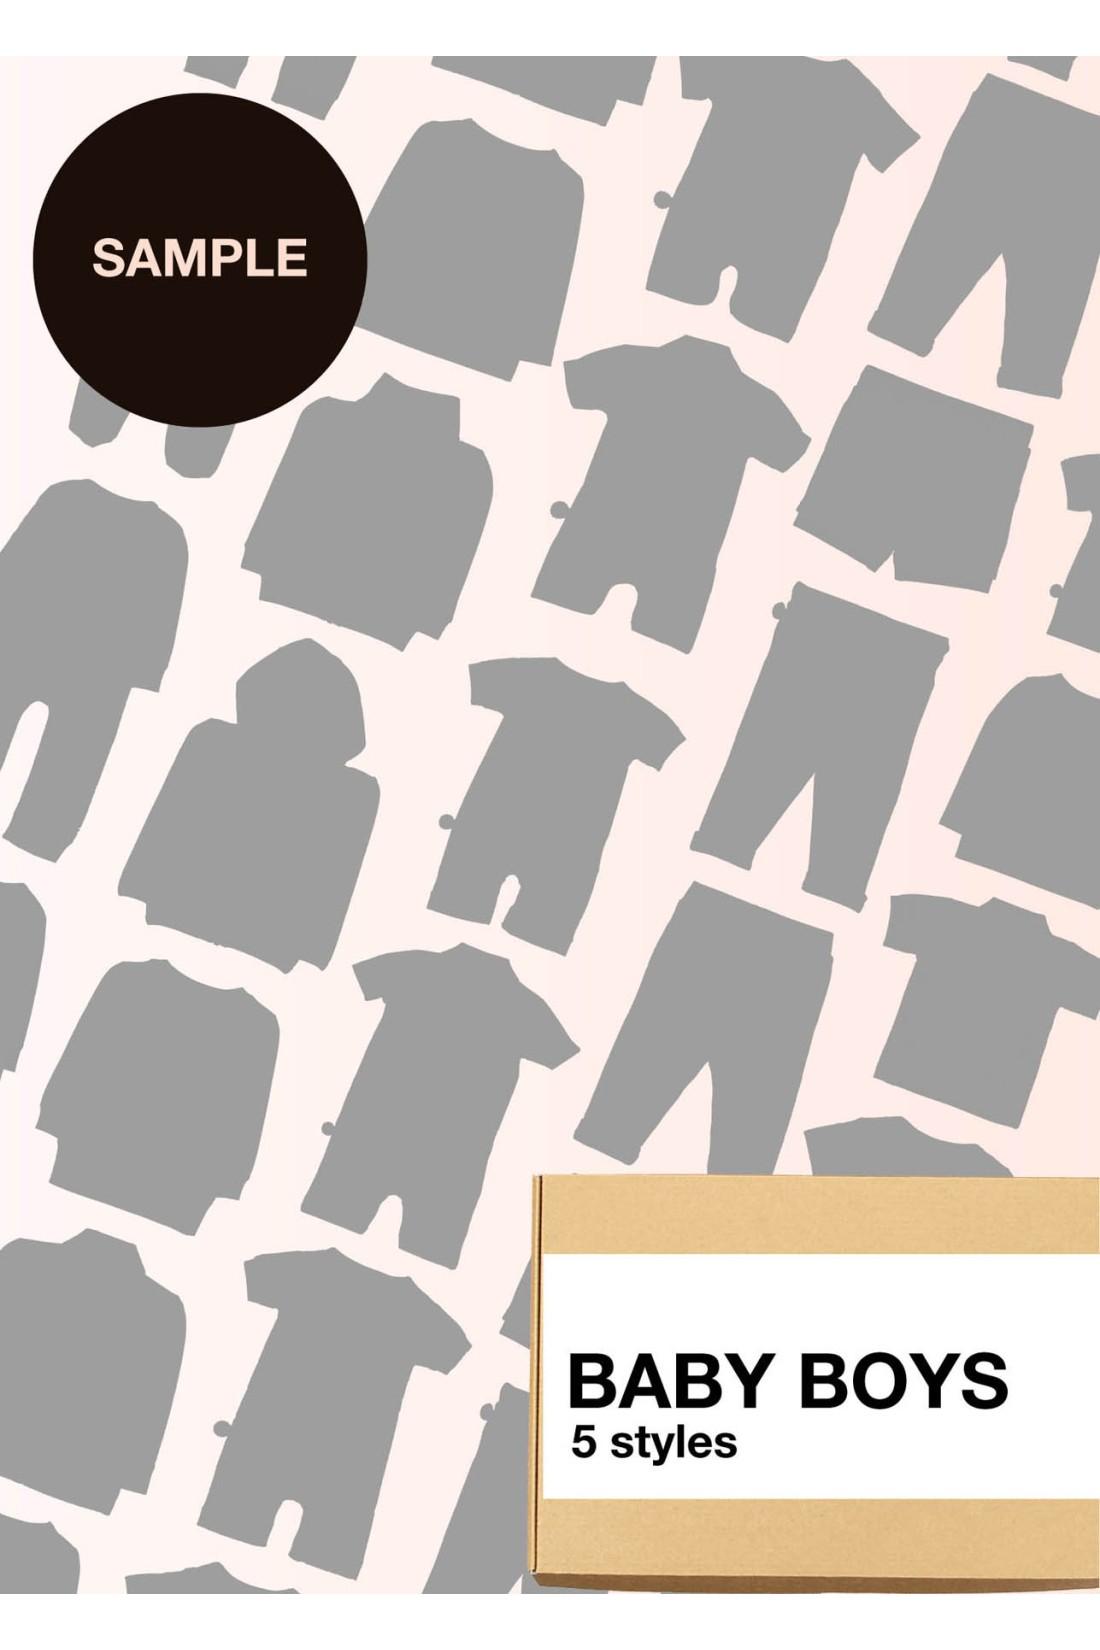 Sample Surprise Box Baby Boy - 5 Styles